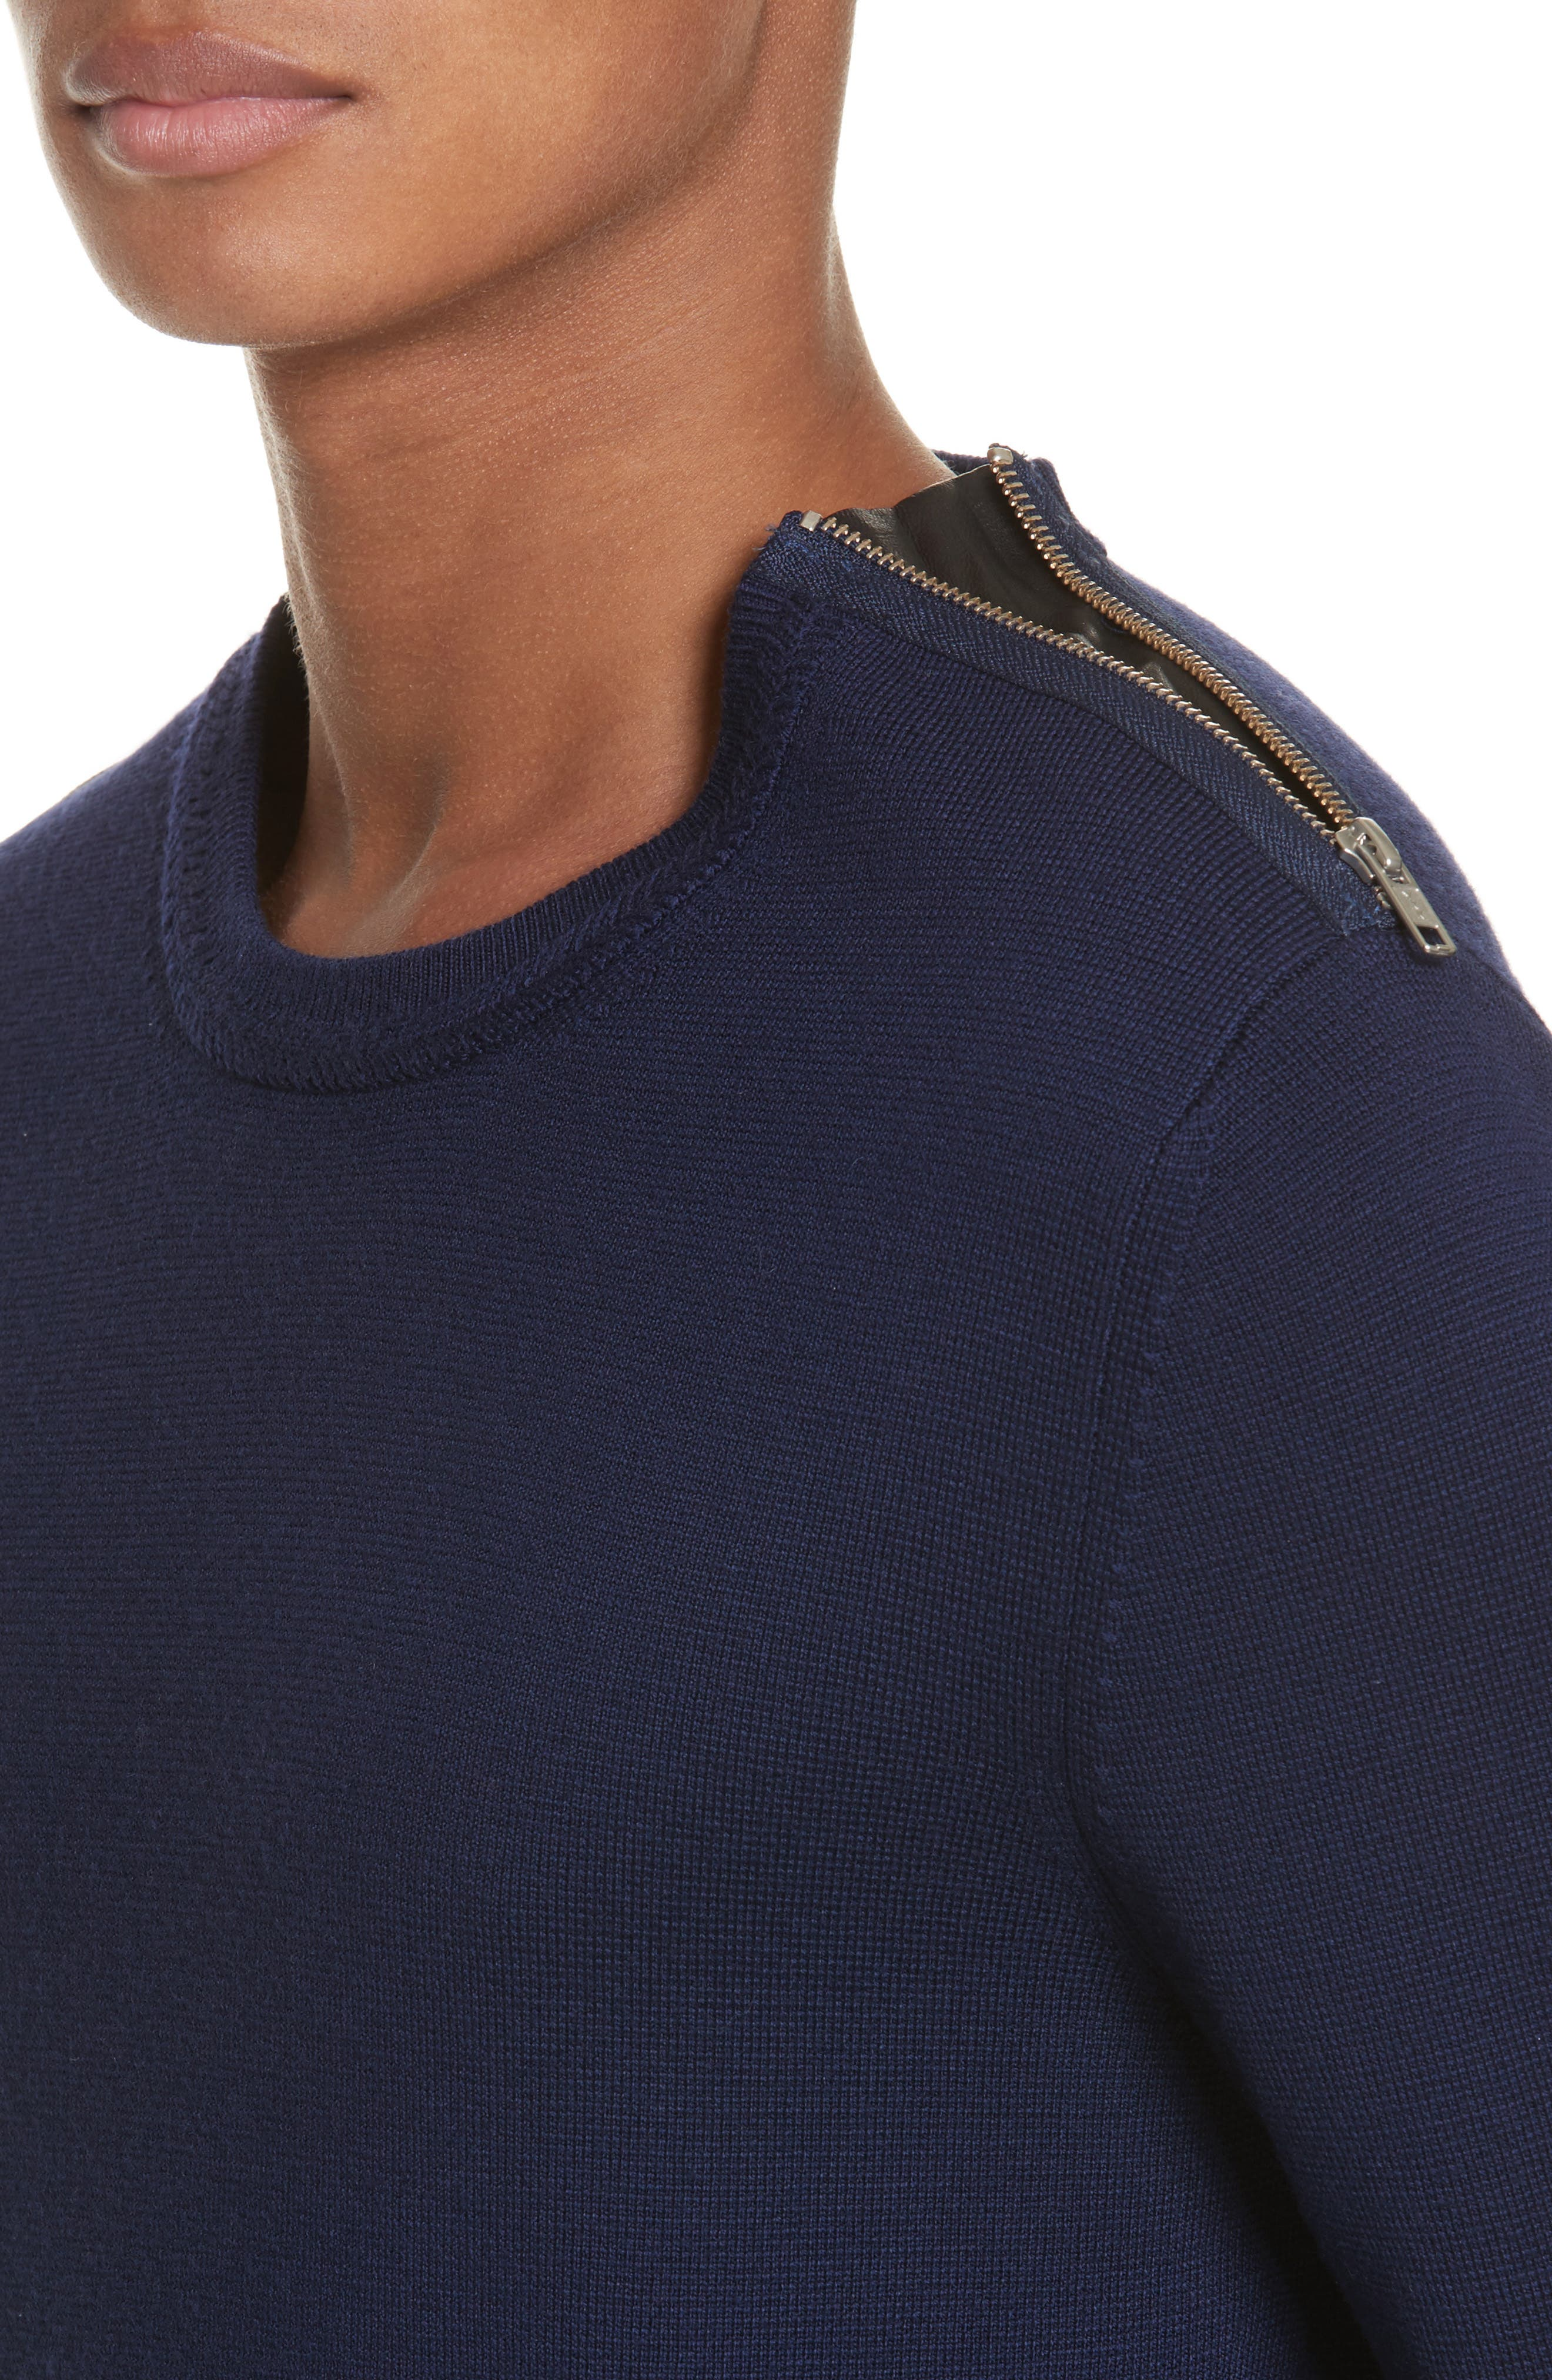 Merino Wool Blend Sweater with Shoulder Zip Trim,                             Alternate thumbnail 4, color,                             Navy